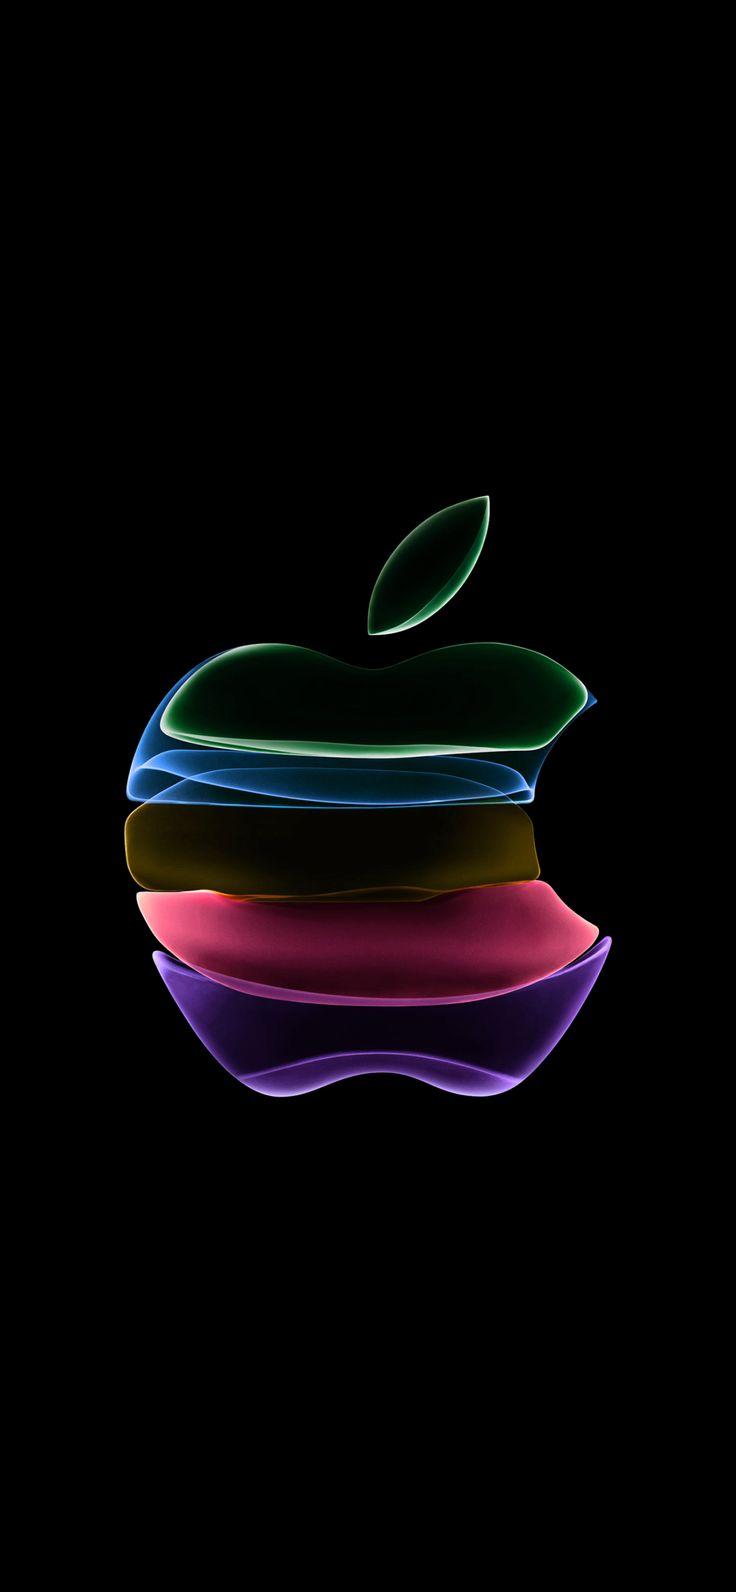 Apple 2019 Apple Logo Wallpaper Iphone Apple Wallpaper Apple Iphone Wallpaper Hd